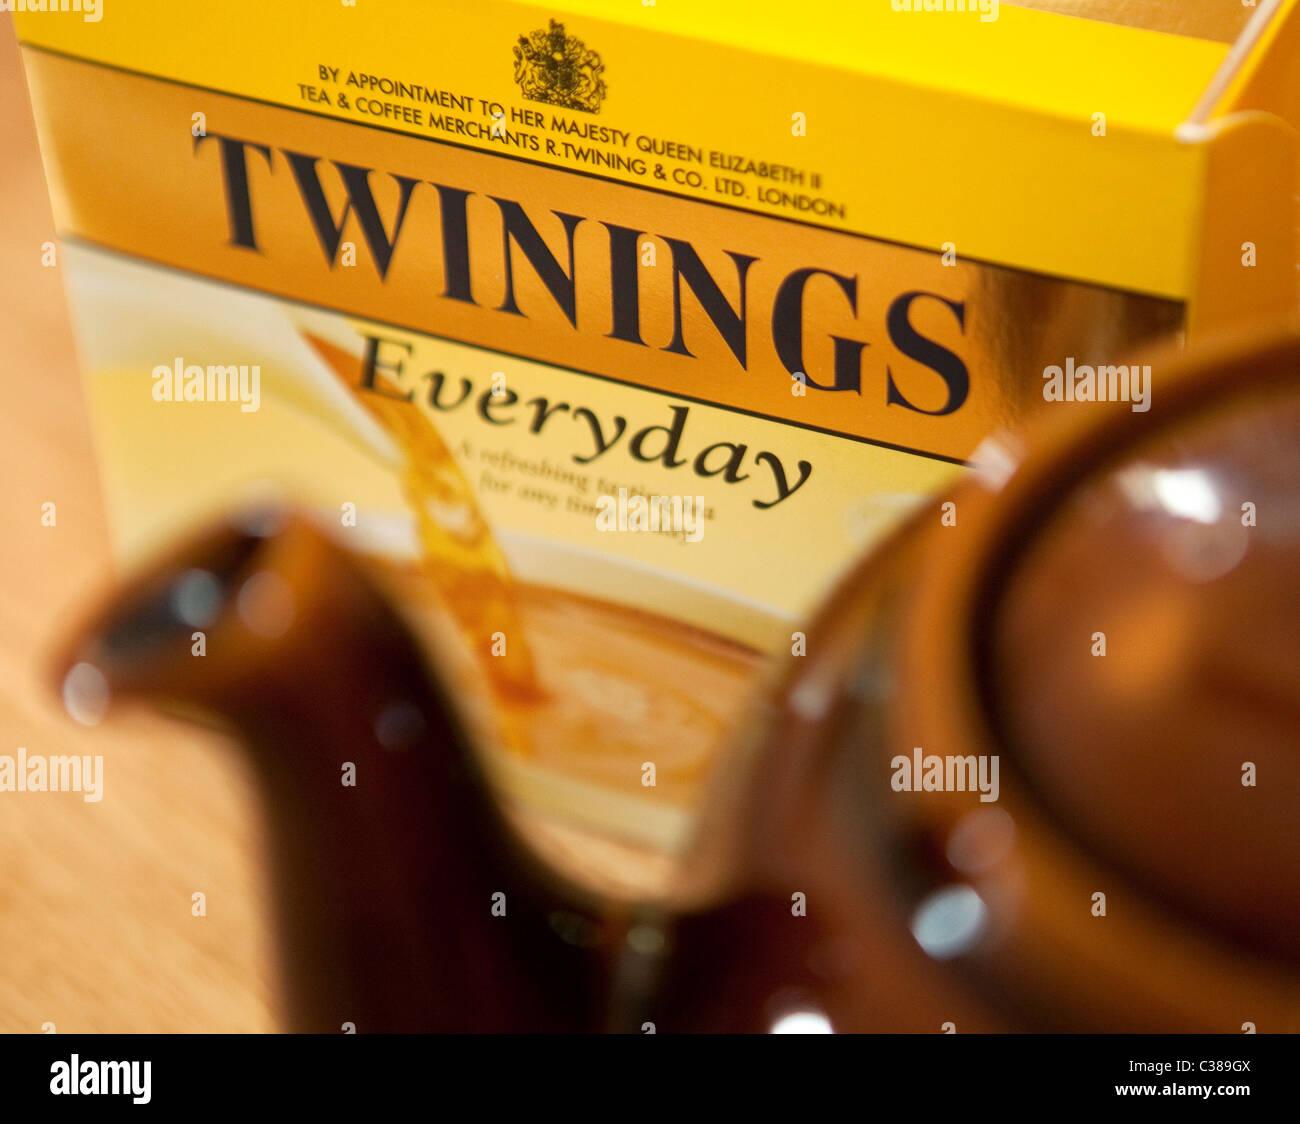 Illustrative image of Twinings Tea, an Associated British Foods brand. - Stock Image